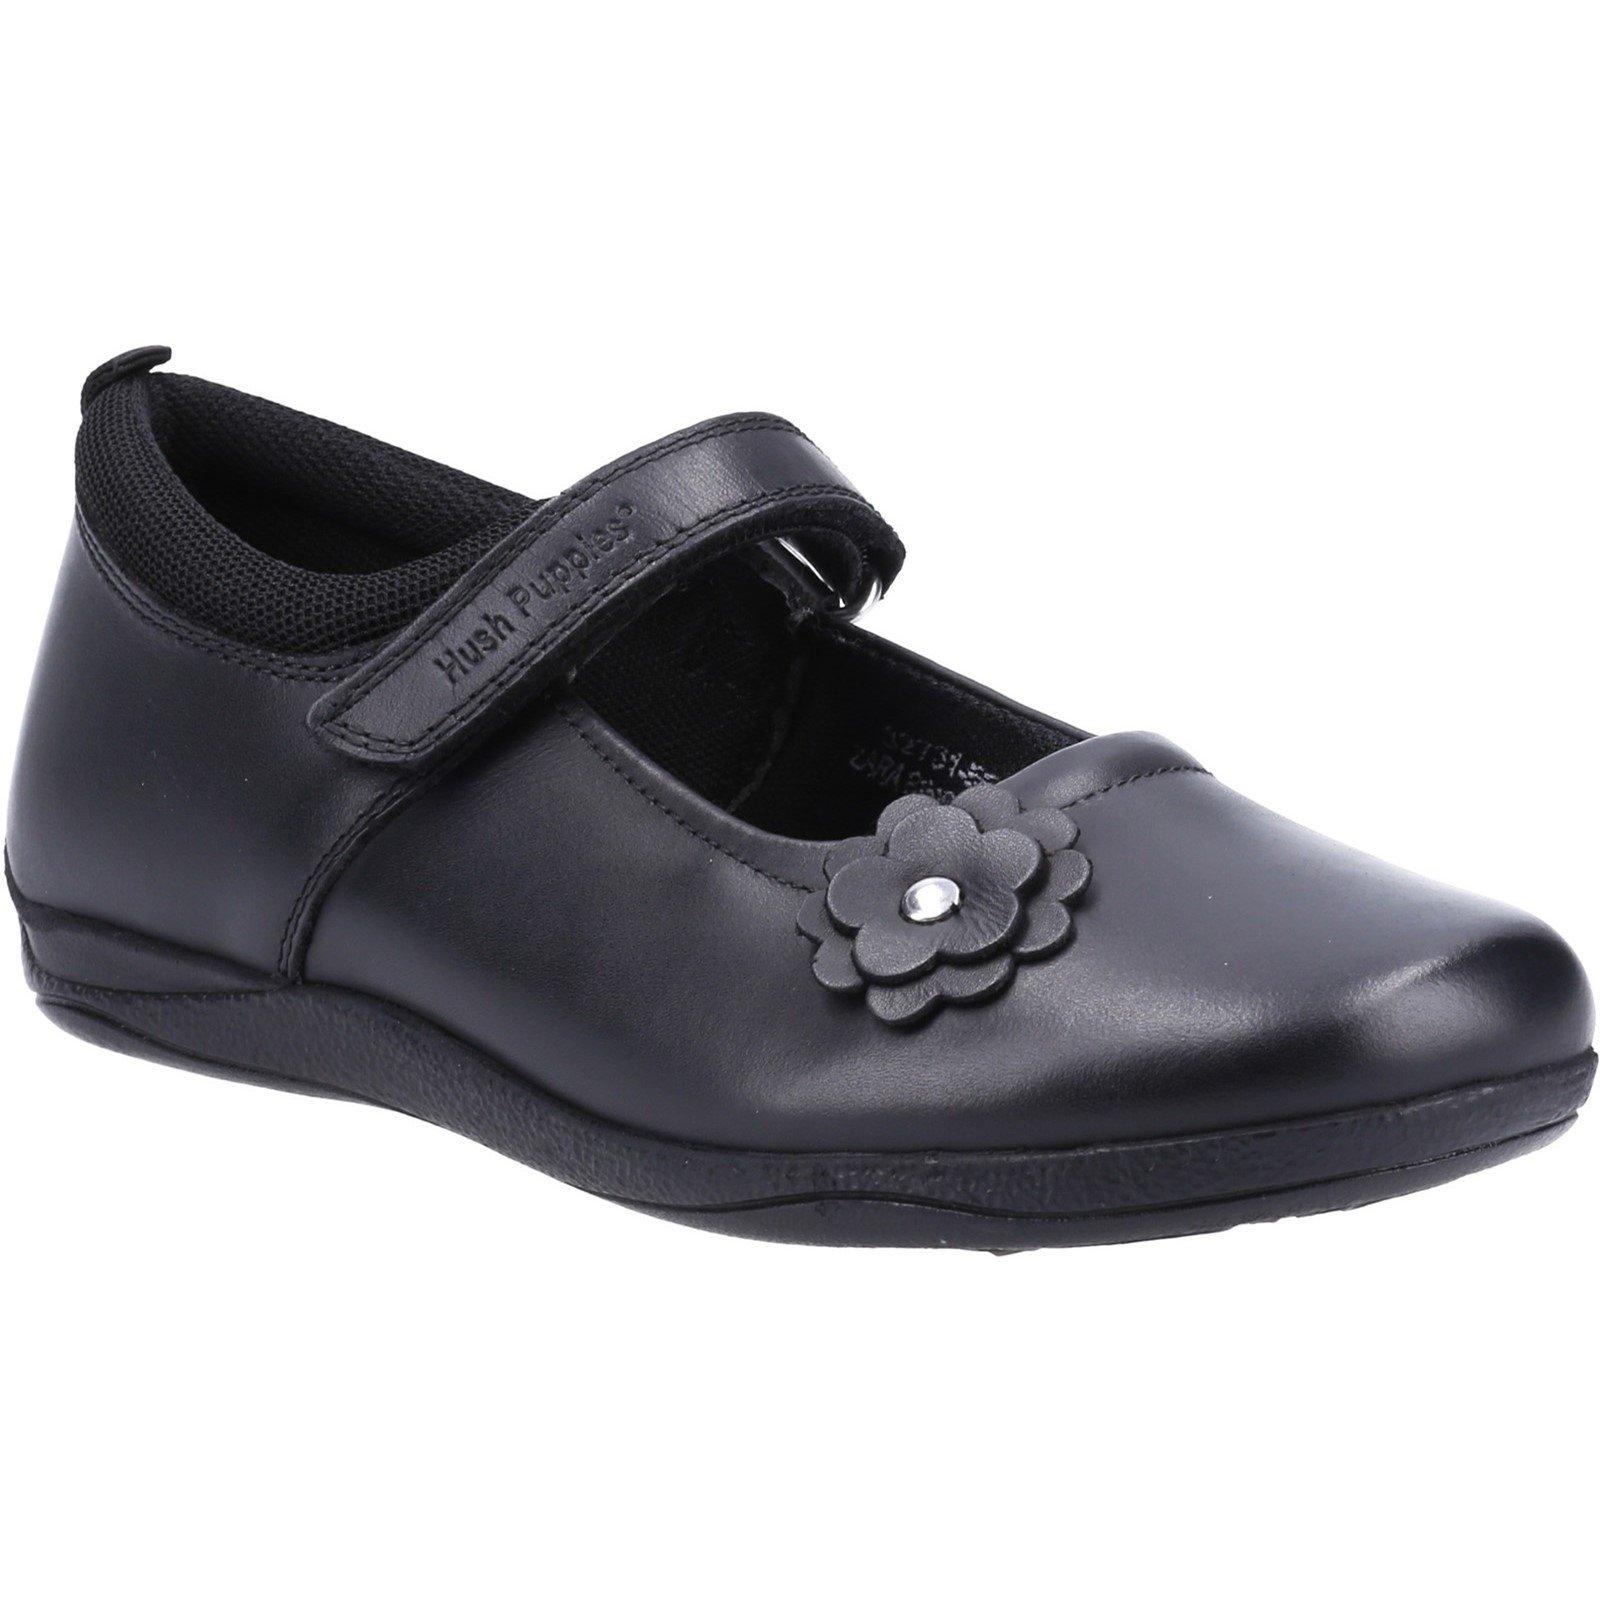 Hush Puppies Kid's Zara Senior School Flat Shoe Black 32732 - Black 6